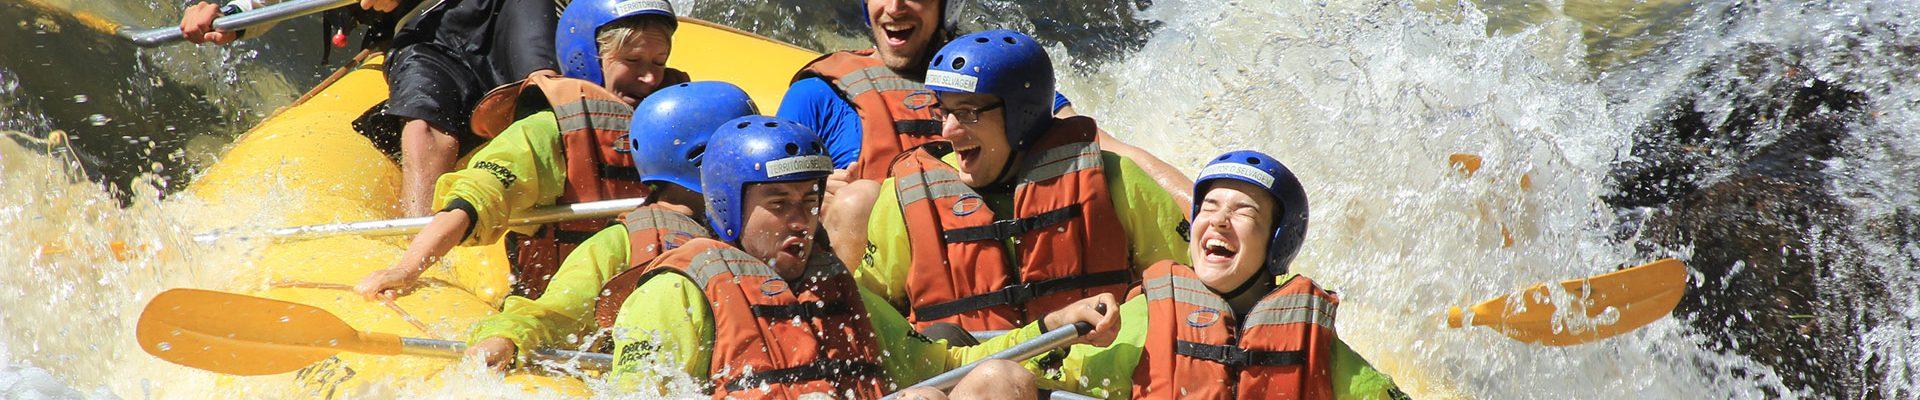 rafting-brotas-estalagem-1